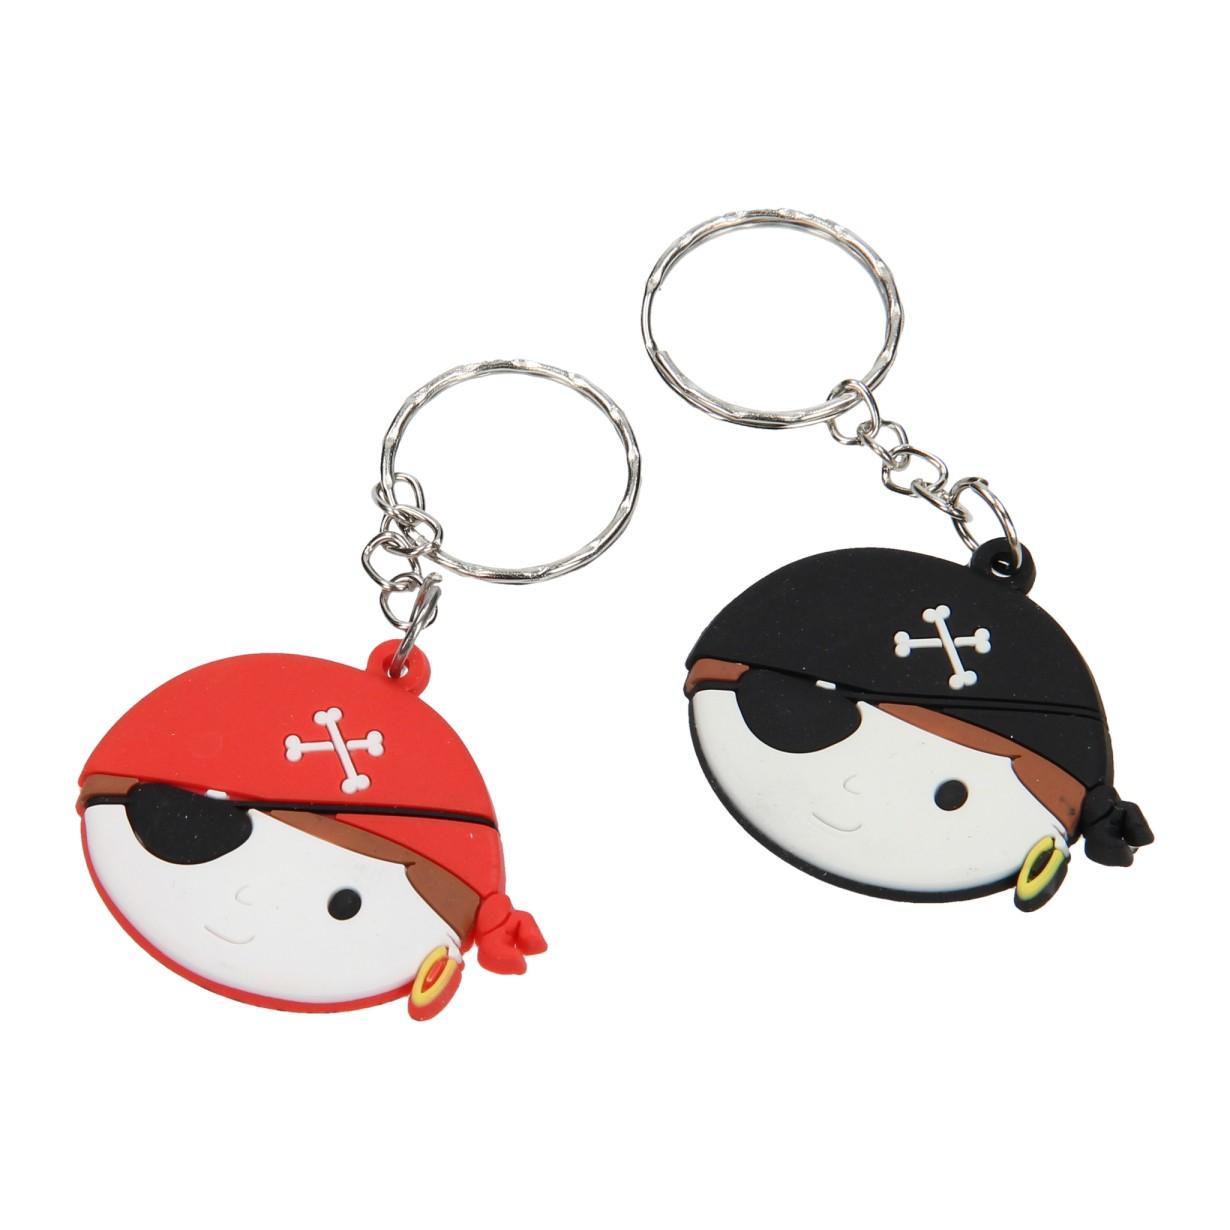 sleutelhanger piraat piraten sleutelhanger speelgoed